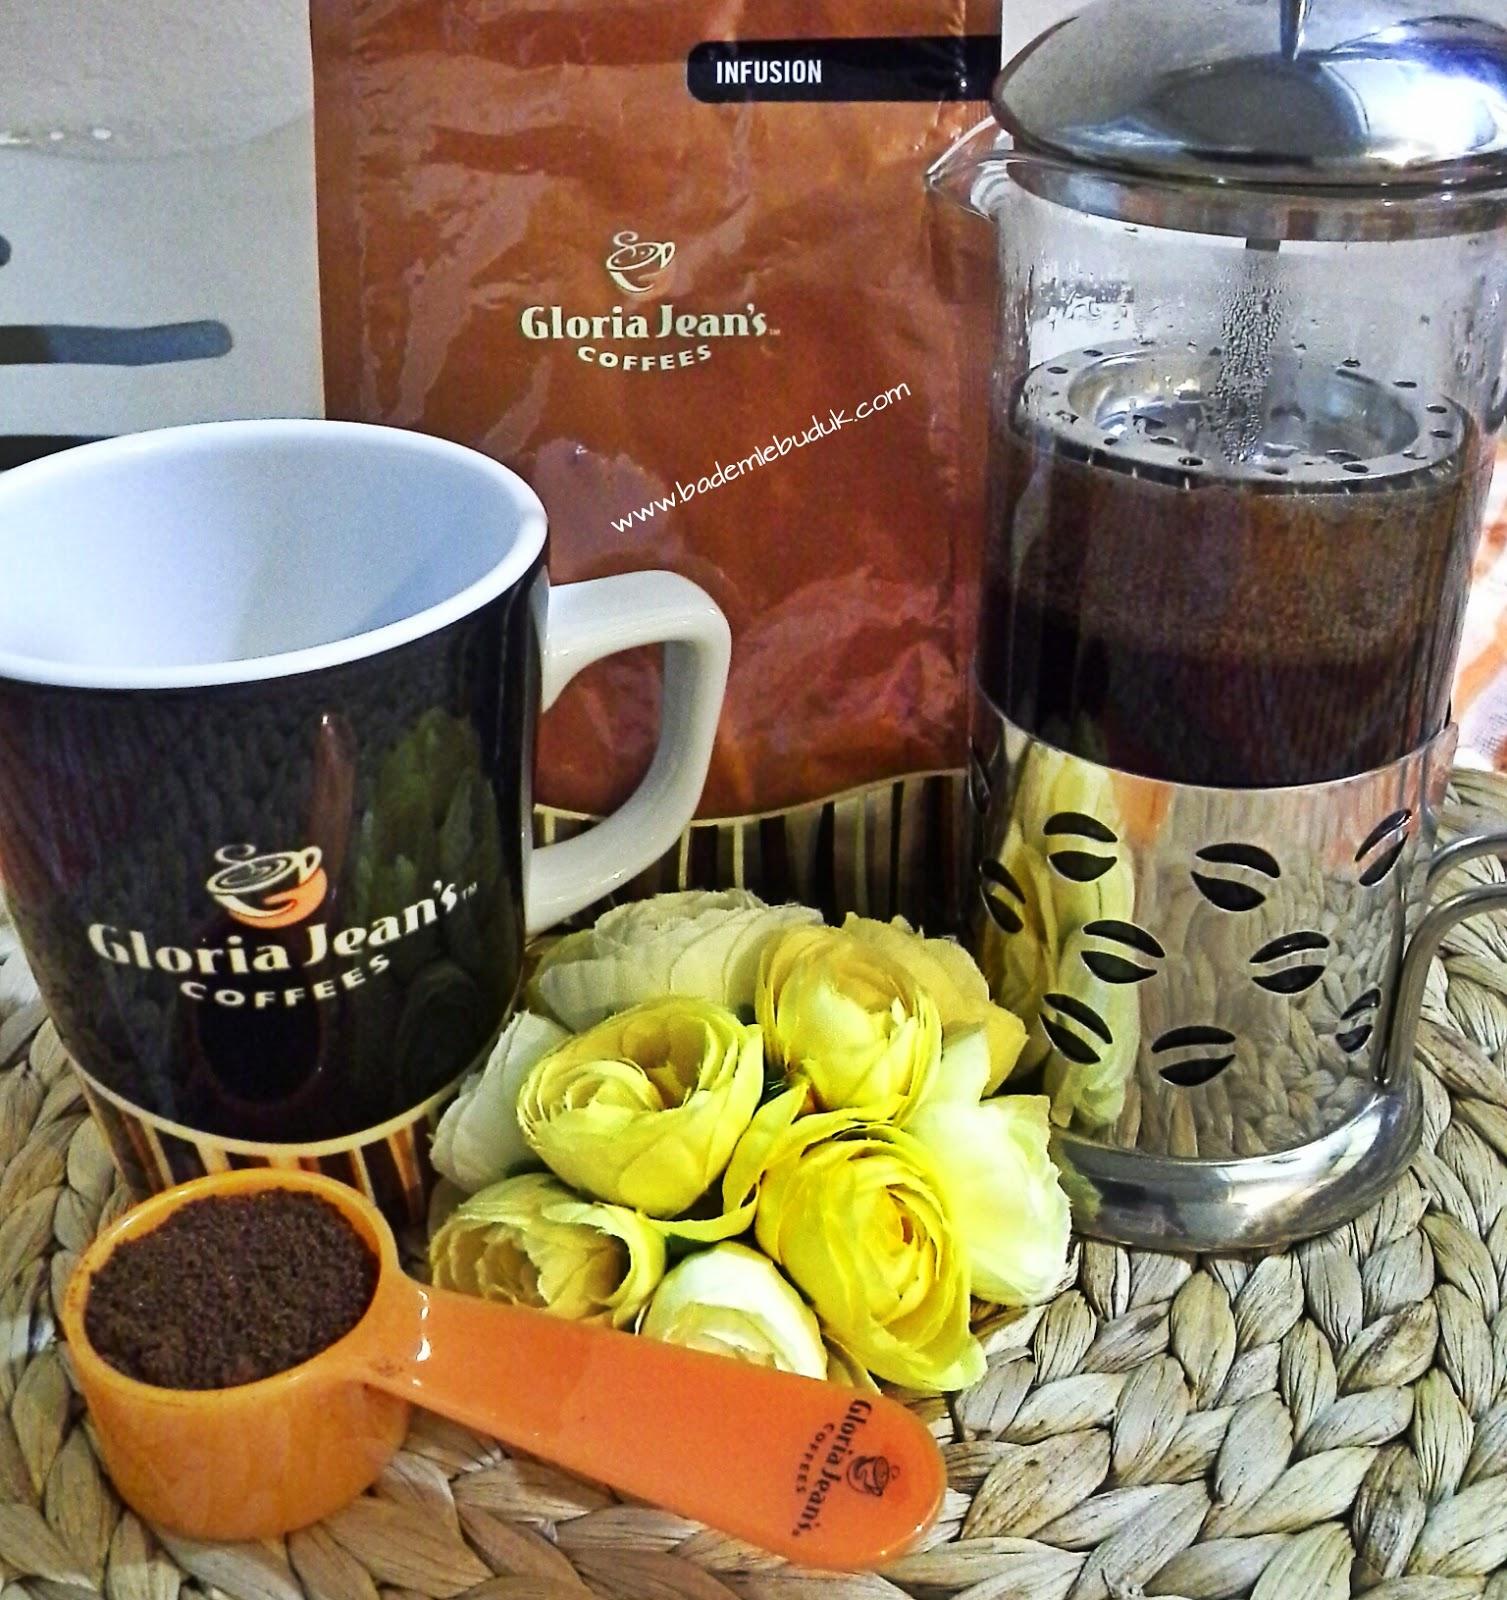 filtre kahve - French Press - kahve hazırlama - filtre kahve nasıl yapılır